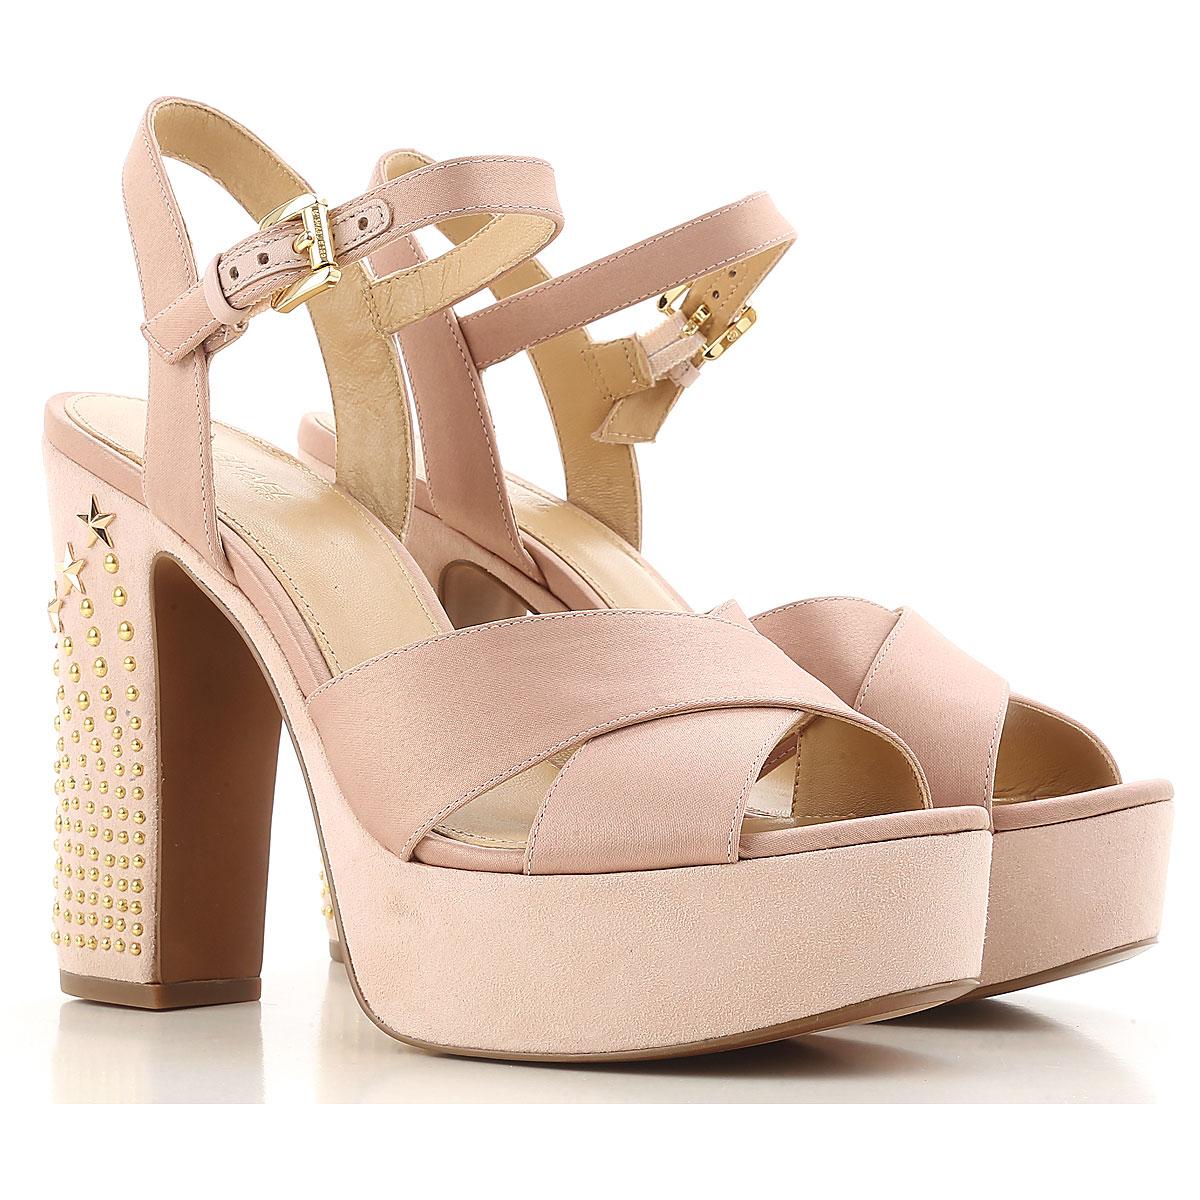 Michael Kors Womens Shoes On Sale, Nude, satin, 2017, 3 3.5 4 4.5 5.5 6